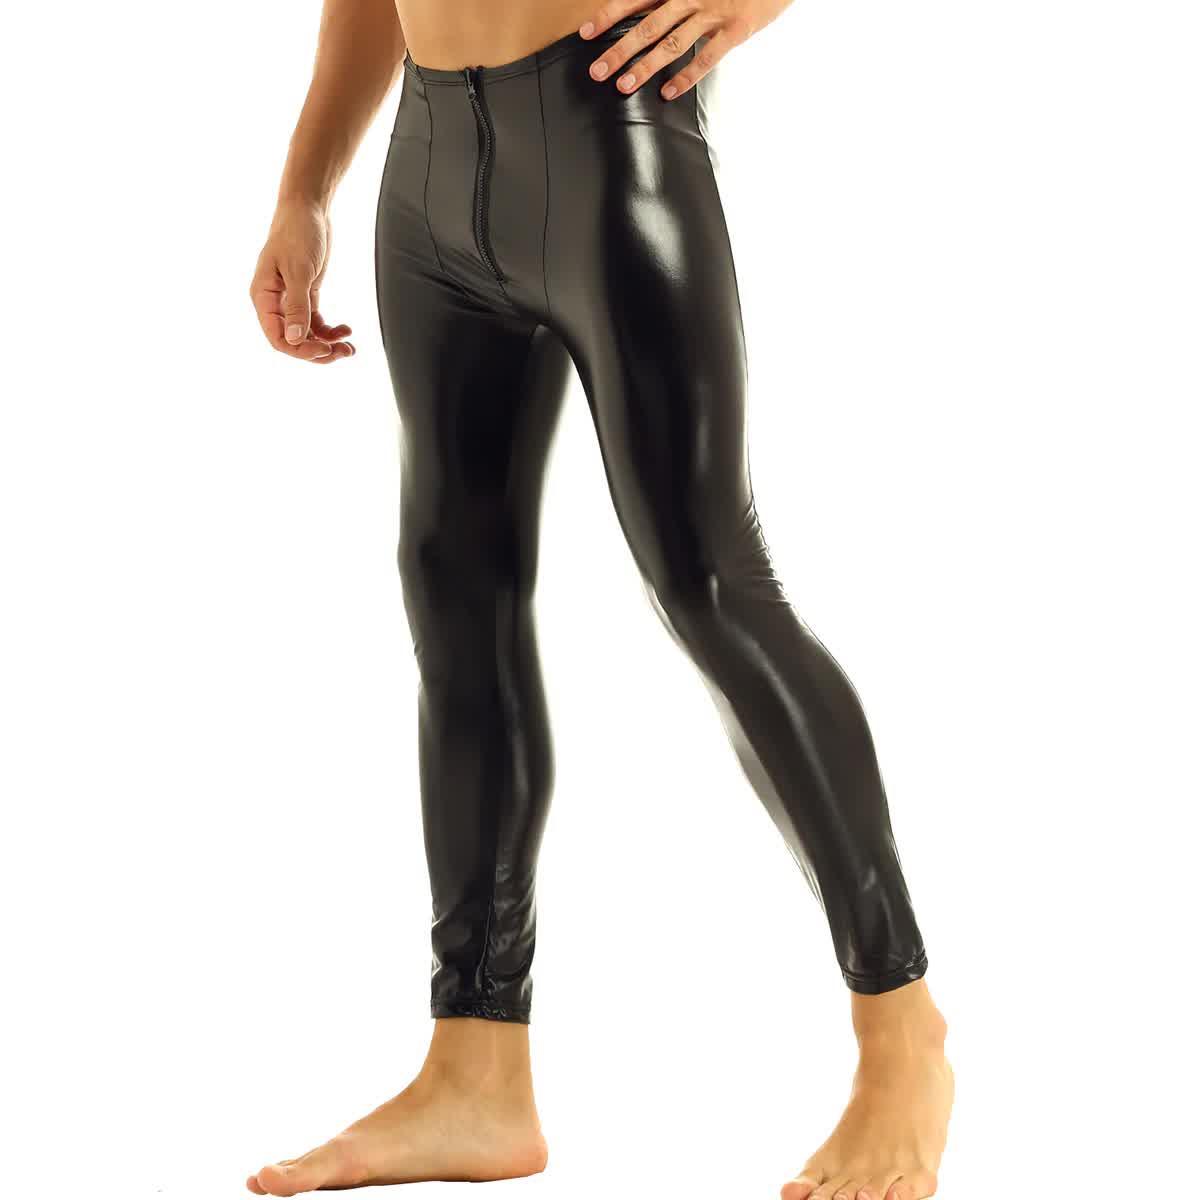 Black Mens Leather Zipper Bulge Pouch Tight Pants ...